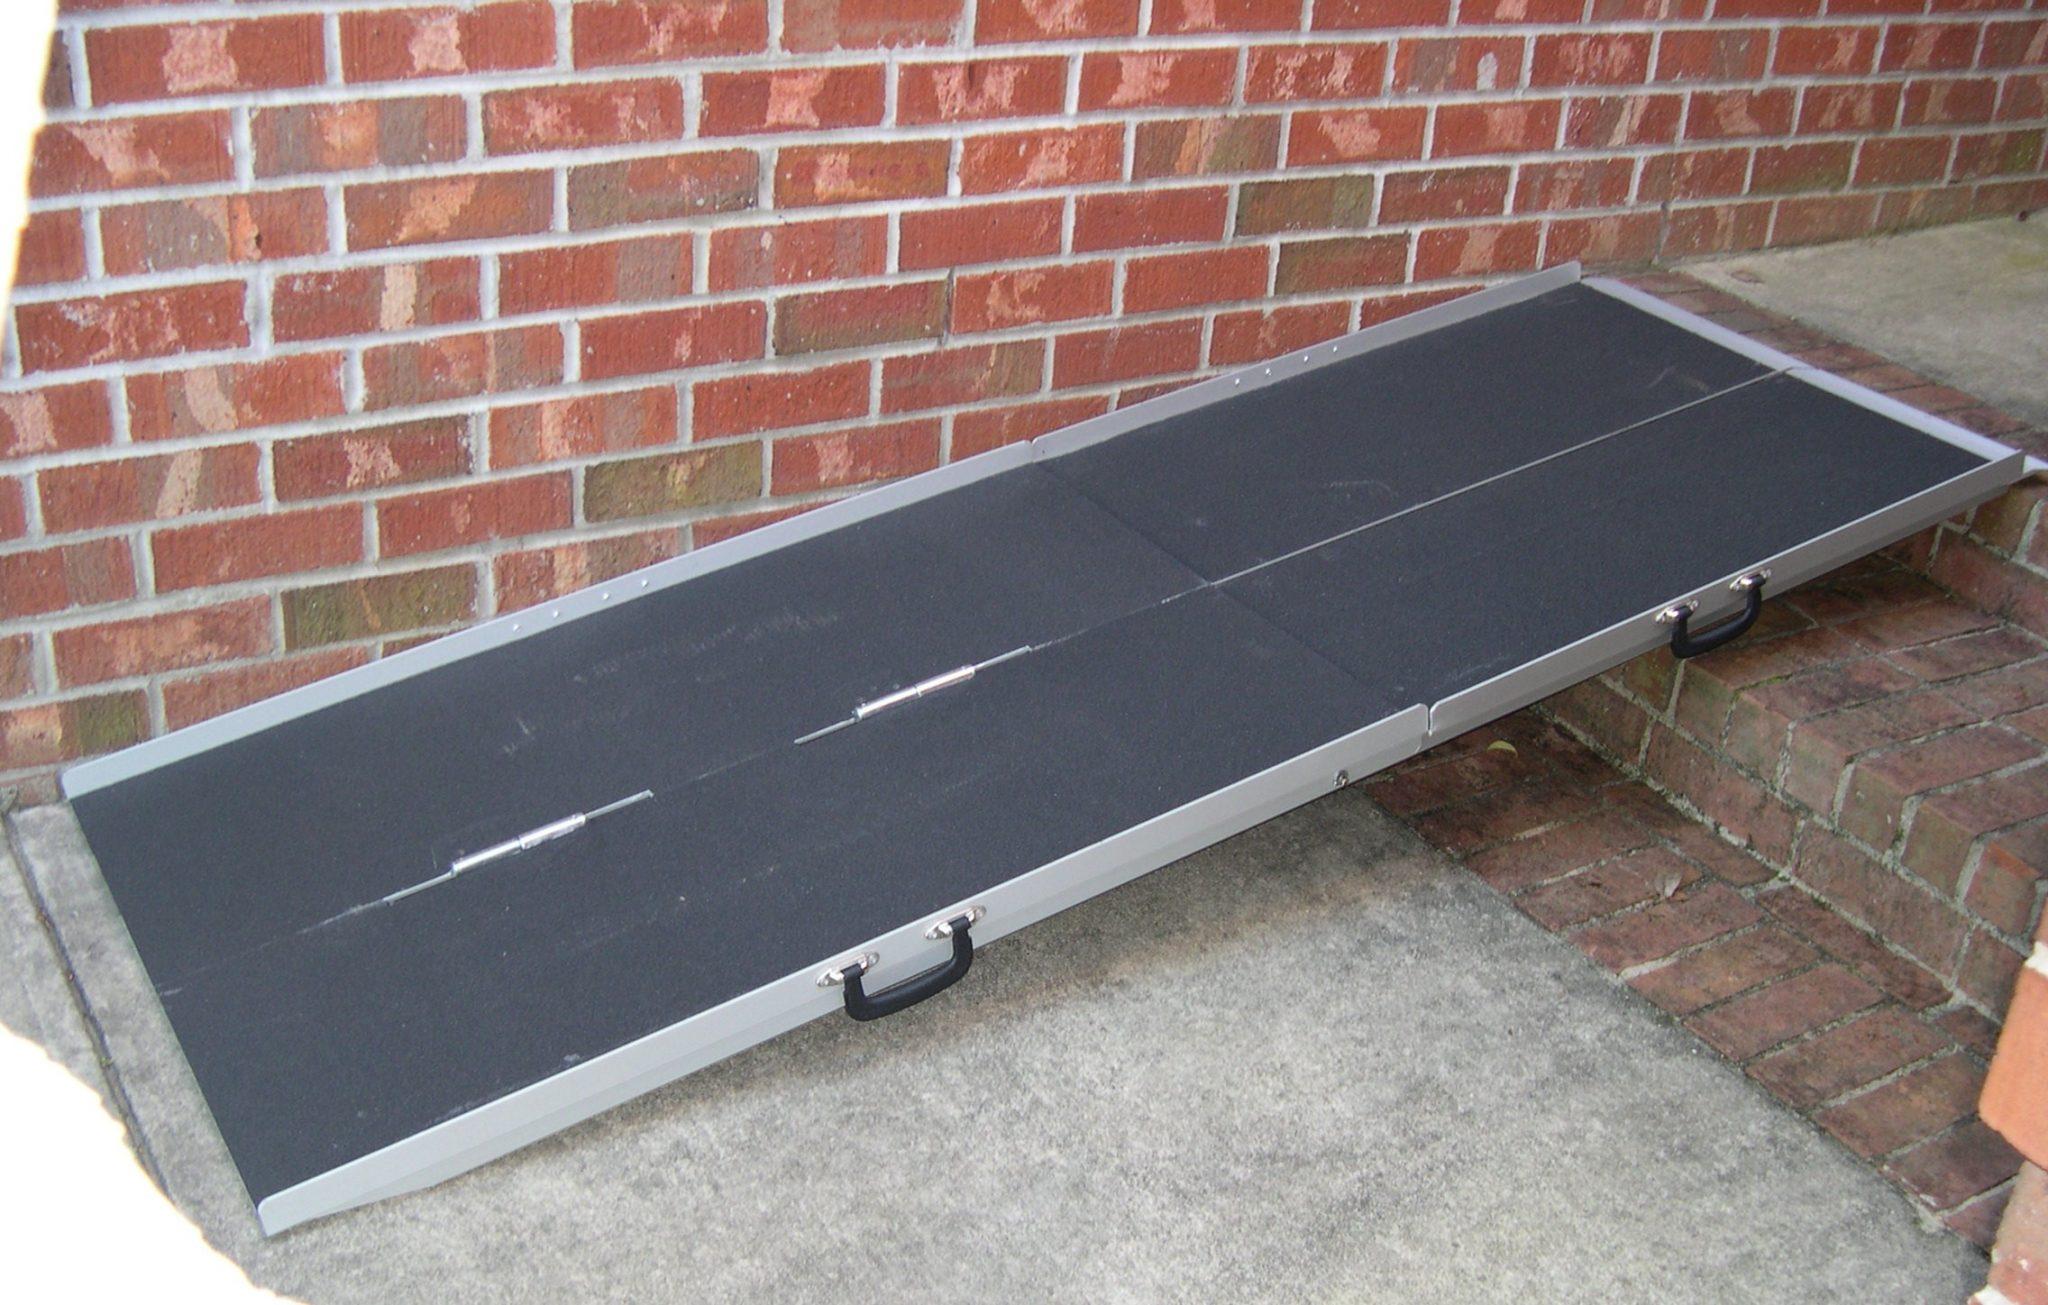 7 39 literamp portable suitcase ramp for Handicapped wheelchair